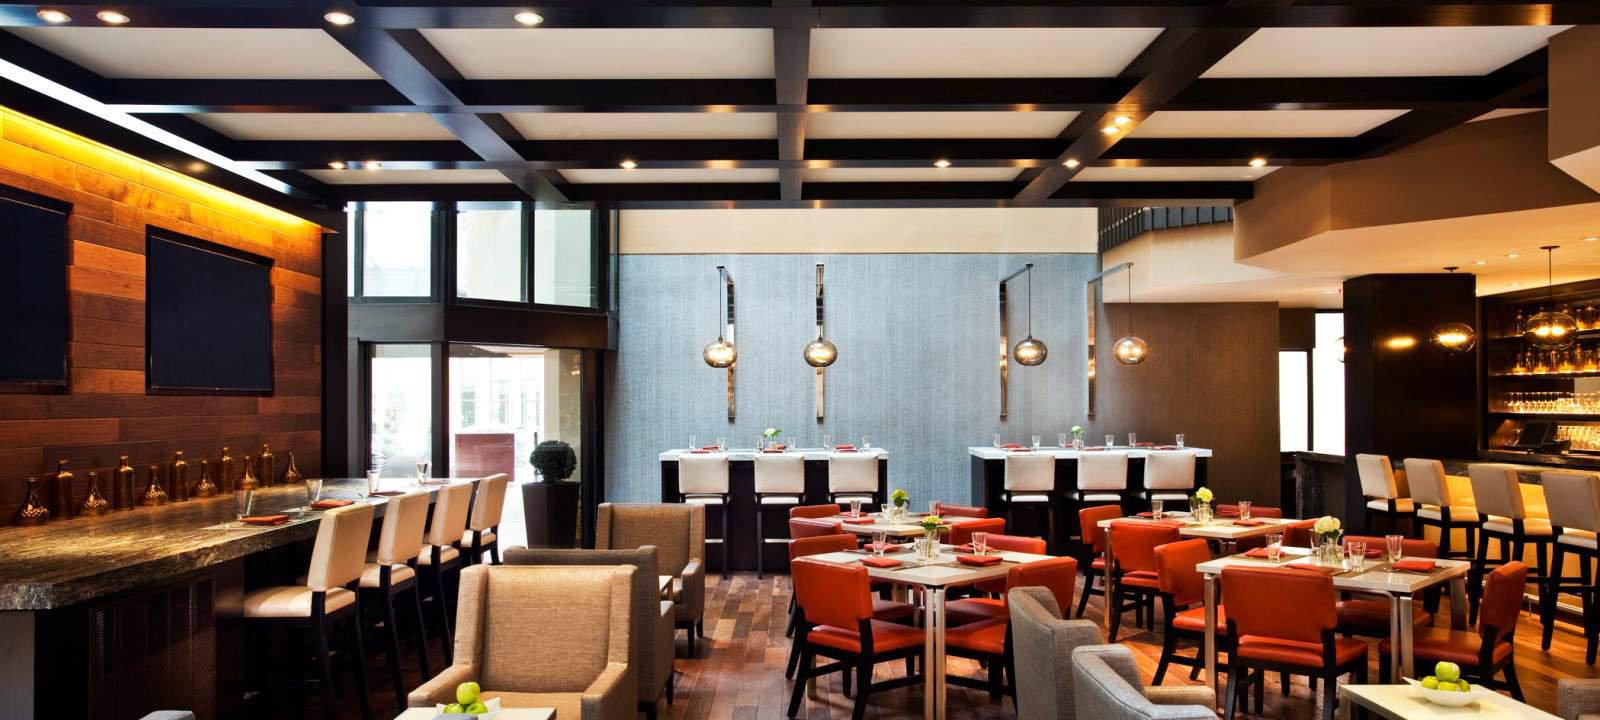 Renovated bar and dining space at The Westin Washington